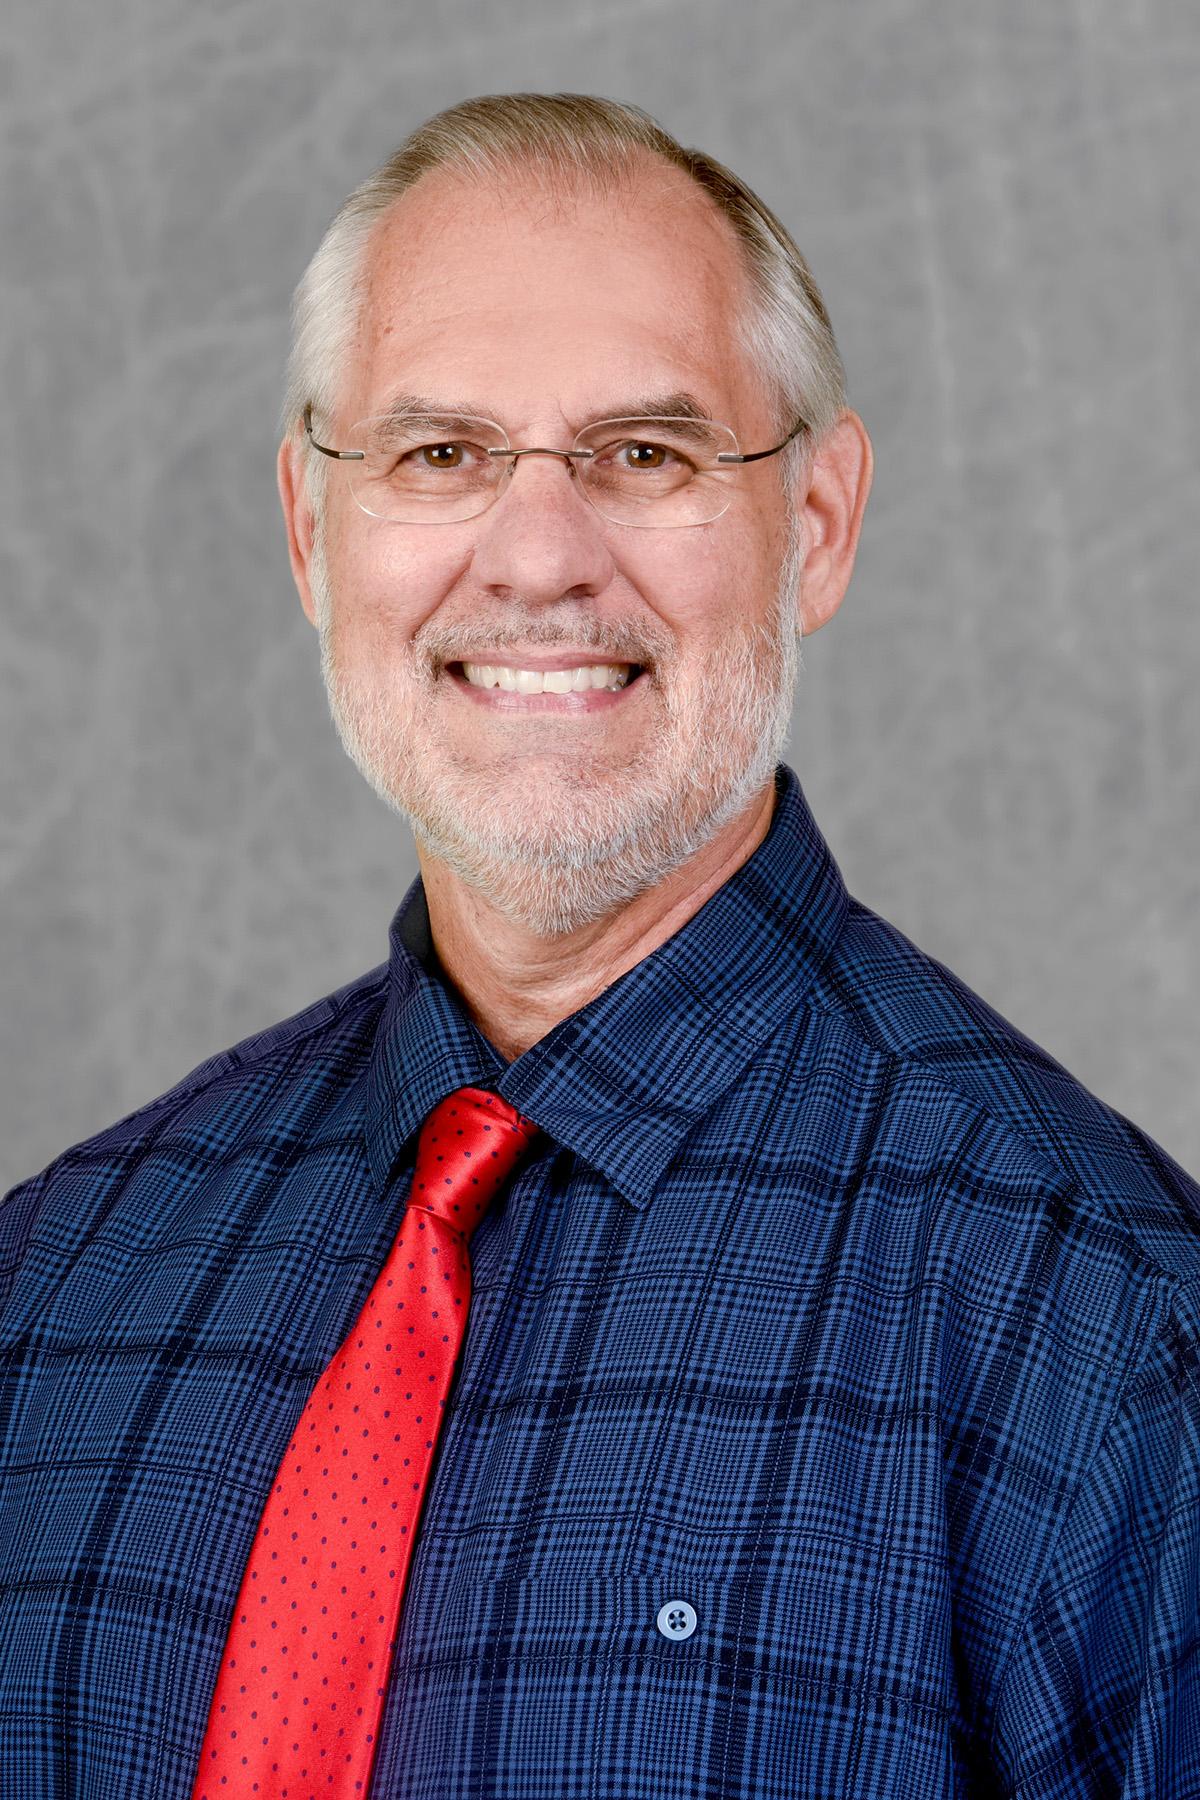 Dr Michael Walden Robert B Butler adoption ncsu NC Press Release economy Oxfam America Methodist Home Children Children's Home Society foster care